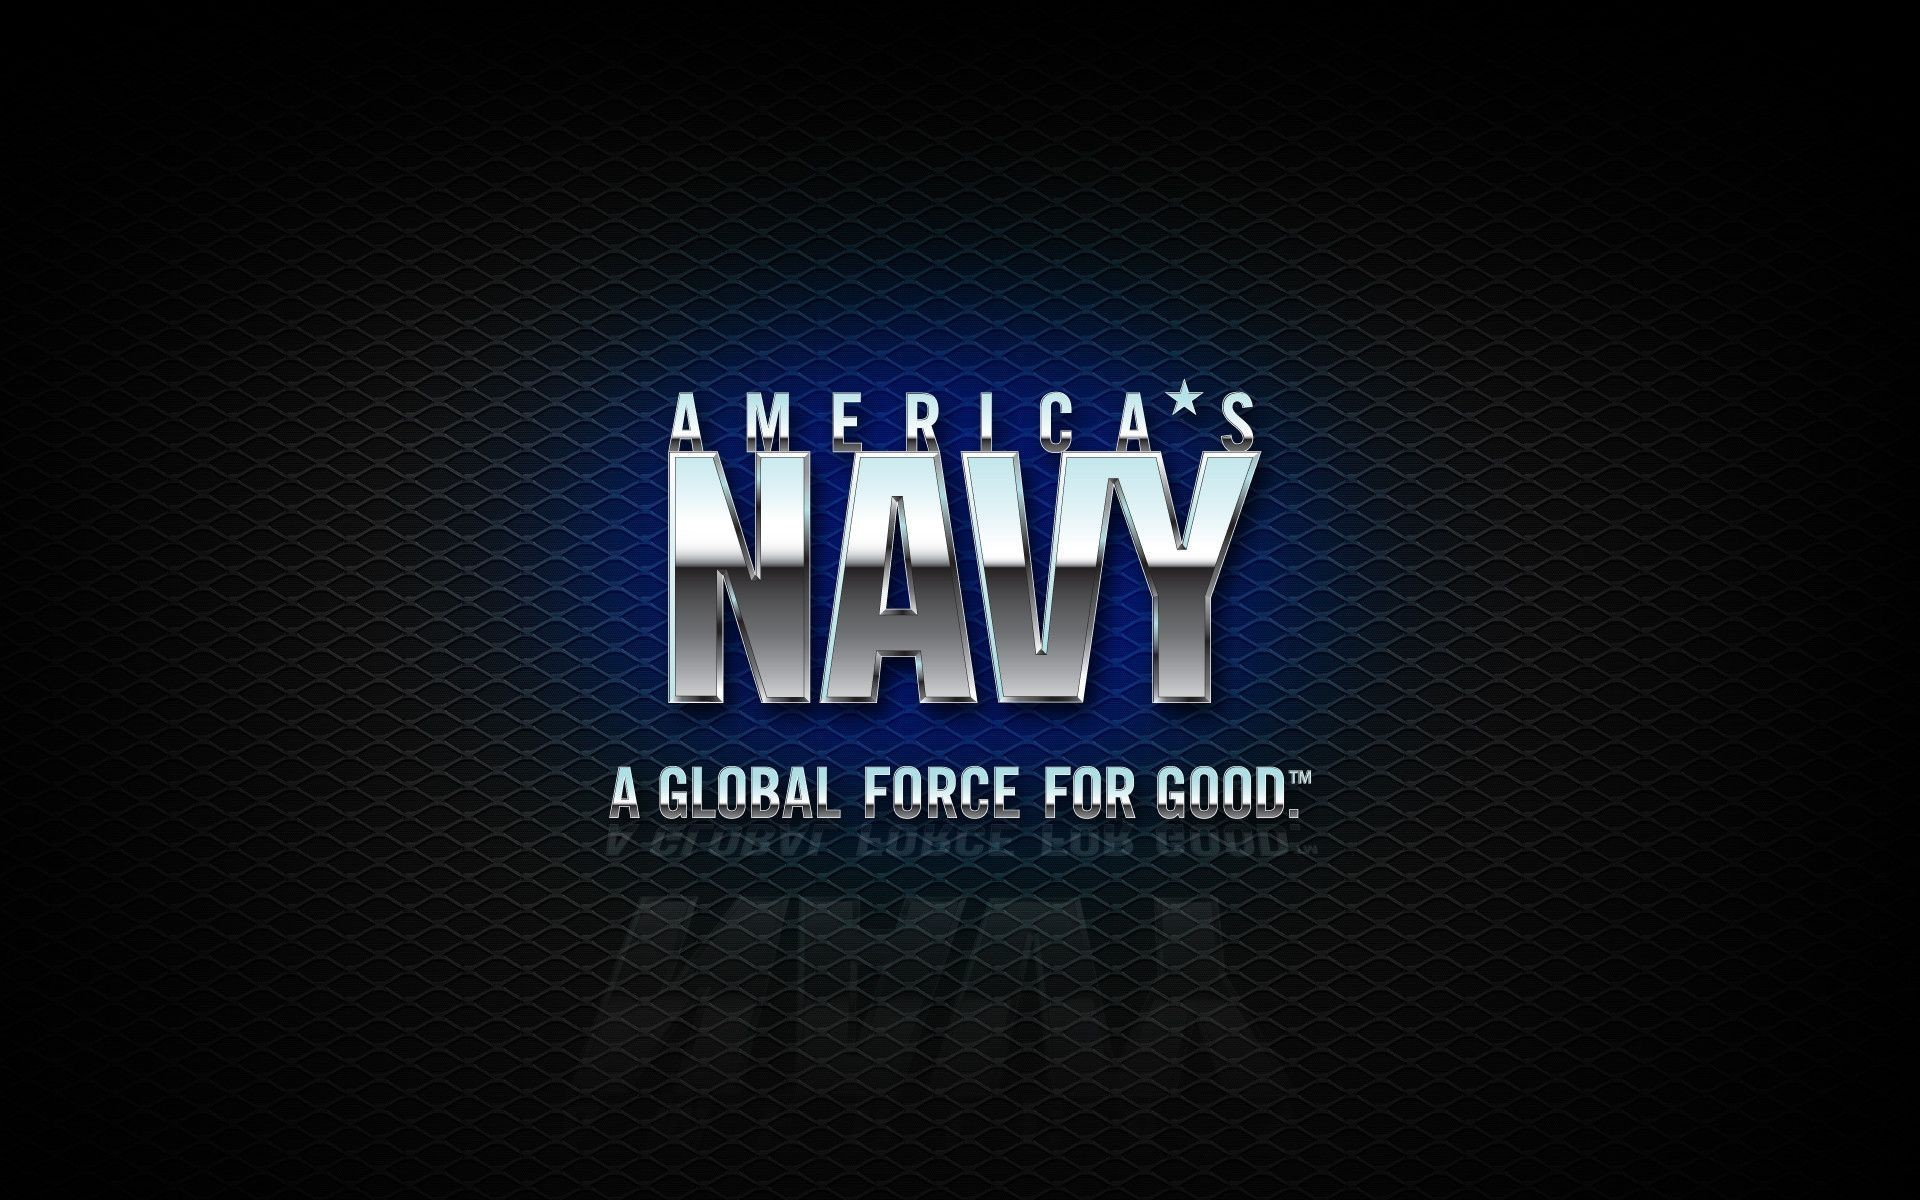 US Navy Seal Logo Wallpaper 56 images 1920x1200